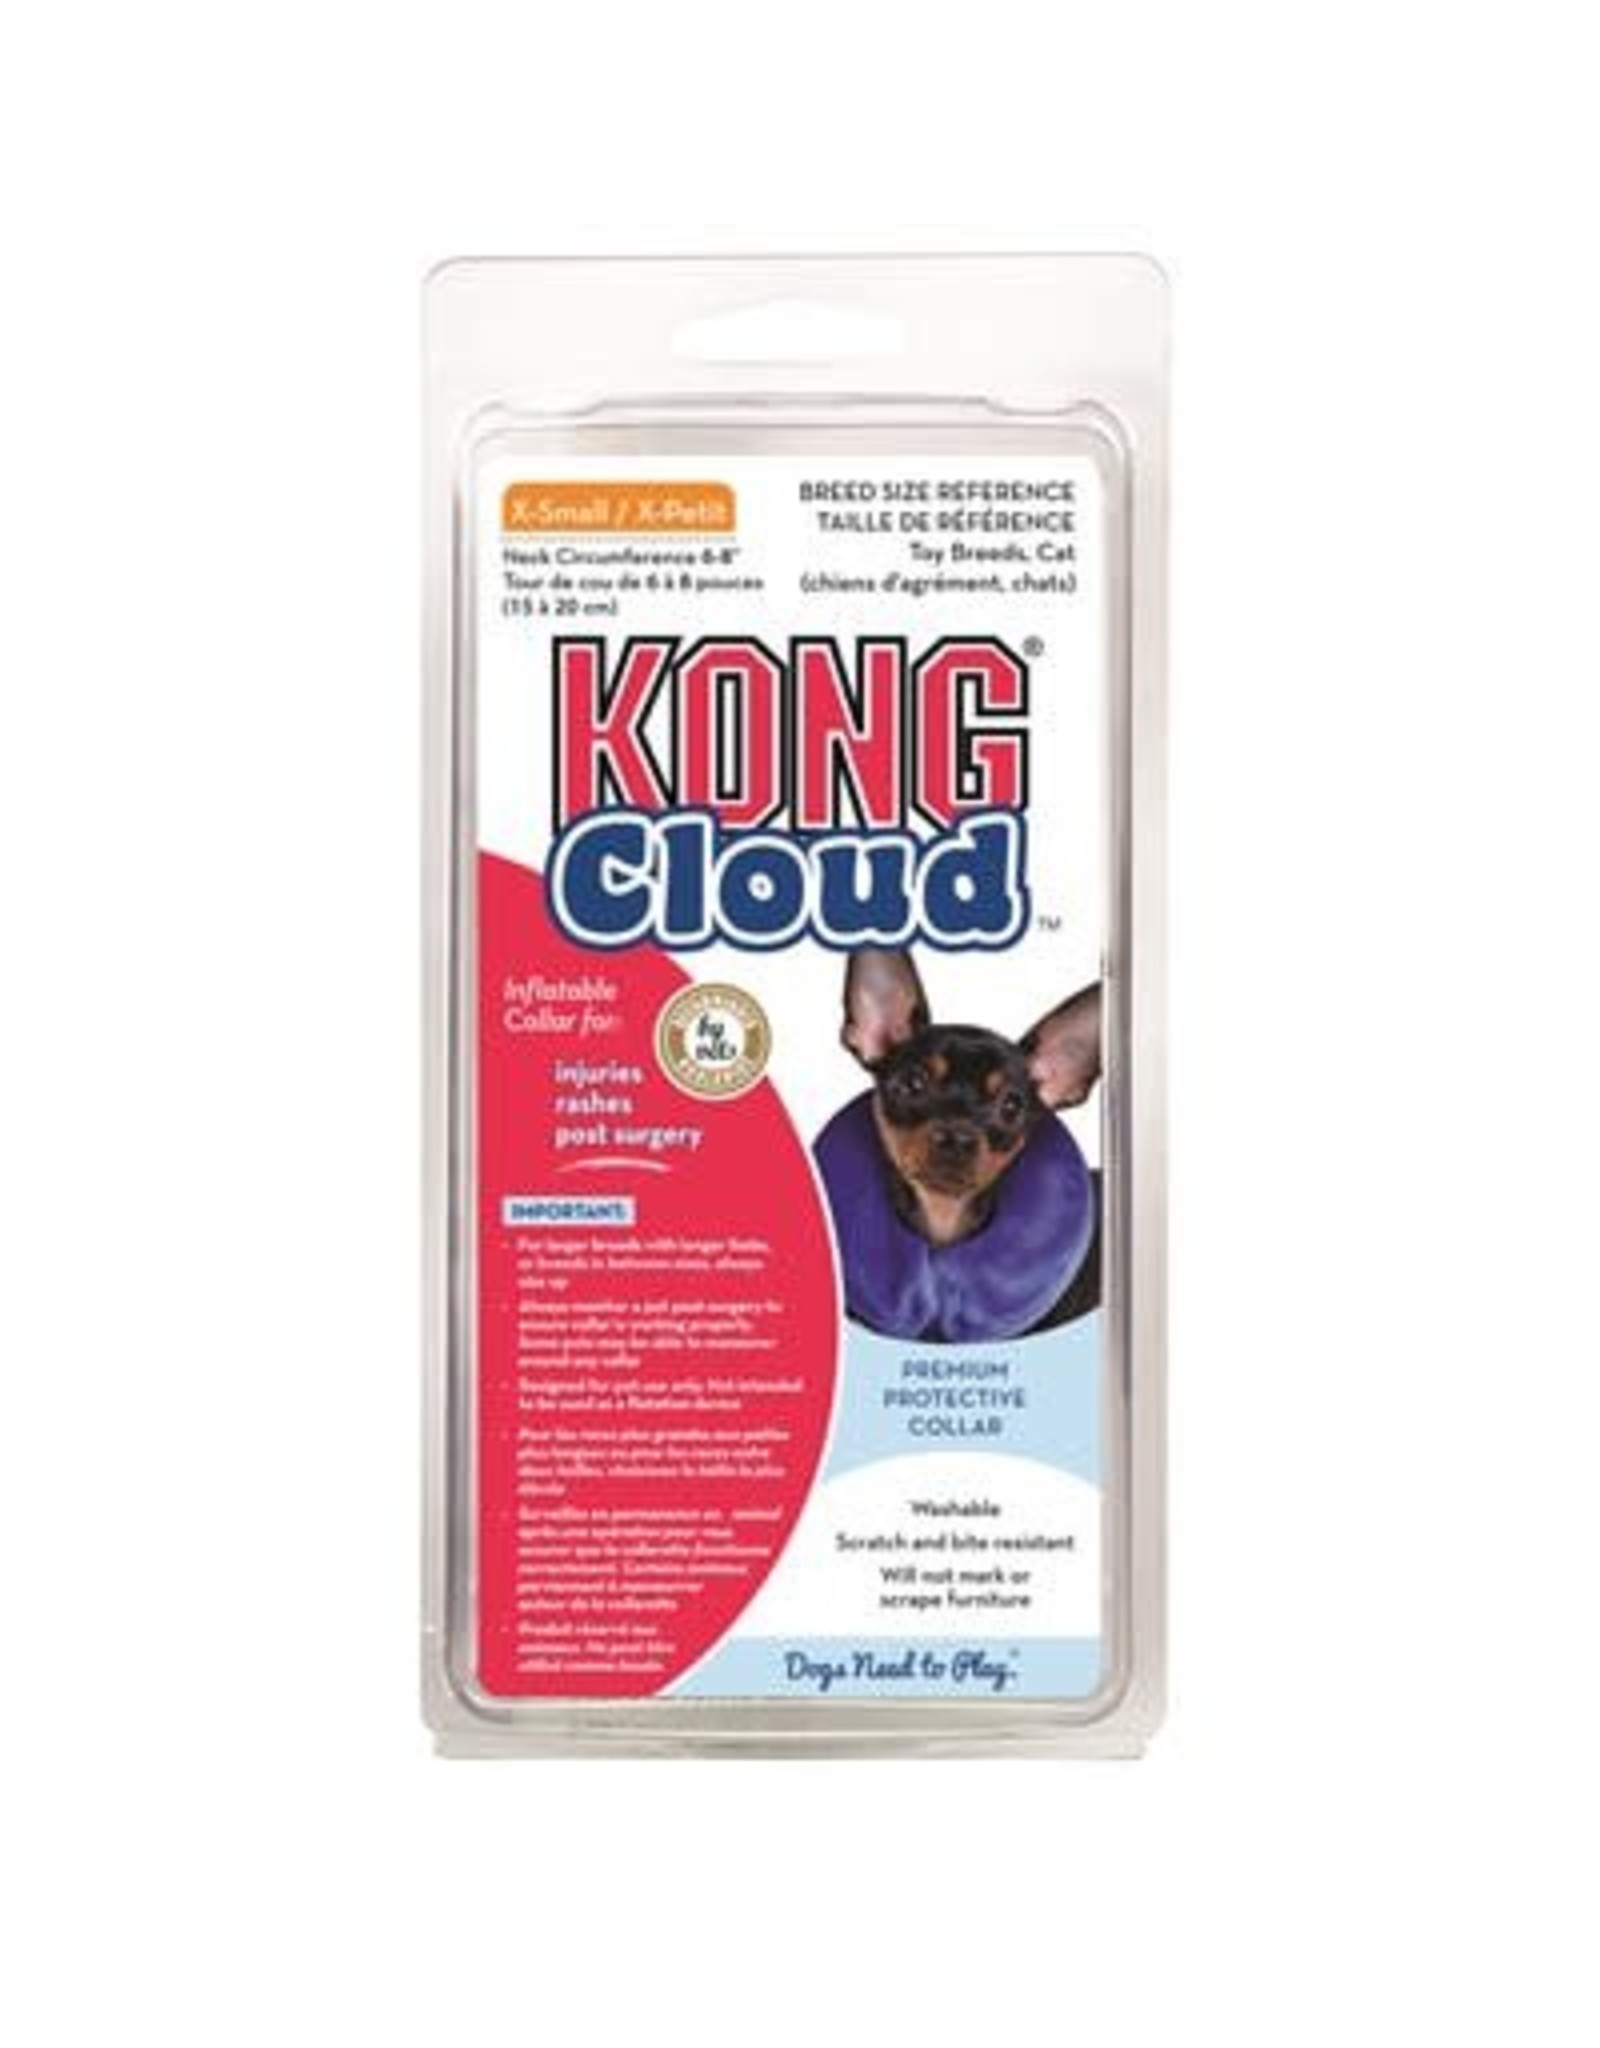 KONG KONG Cloud Collar X-Small